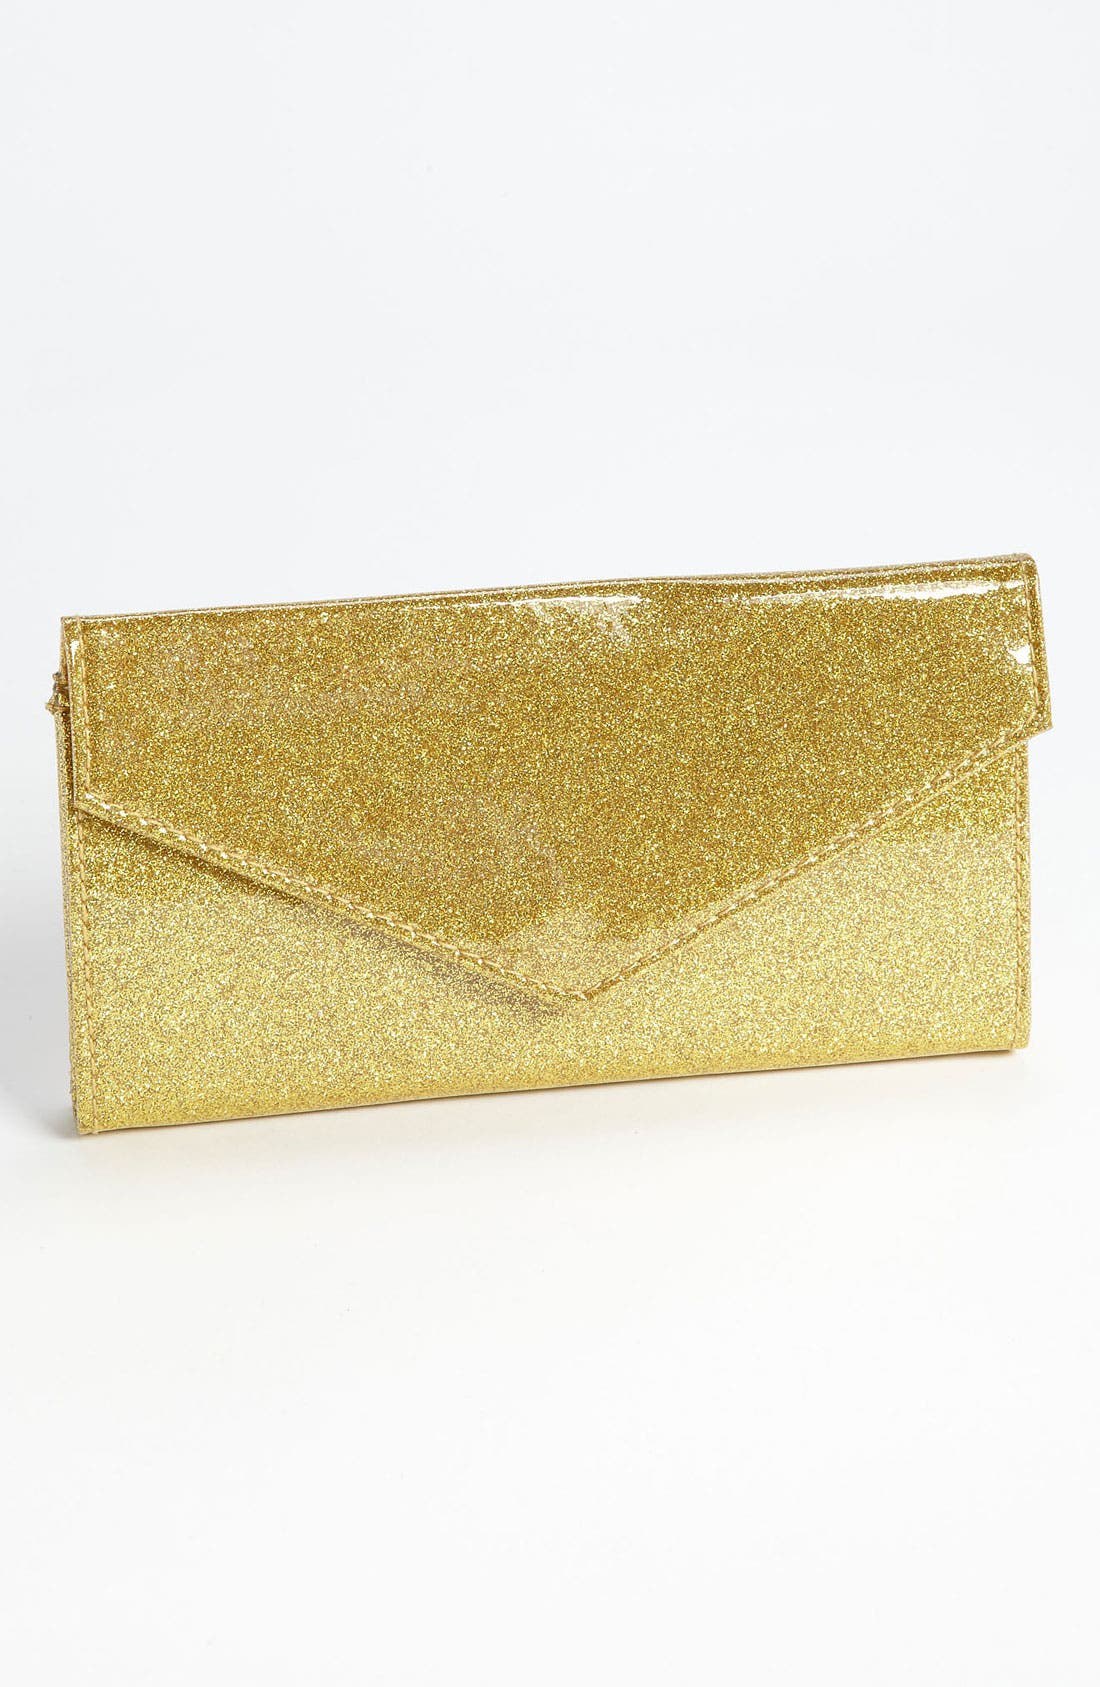 Alternate Image 1 Selected - Lulu Glitter Envelope Wallet